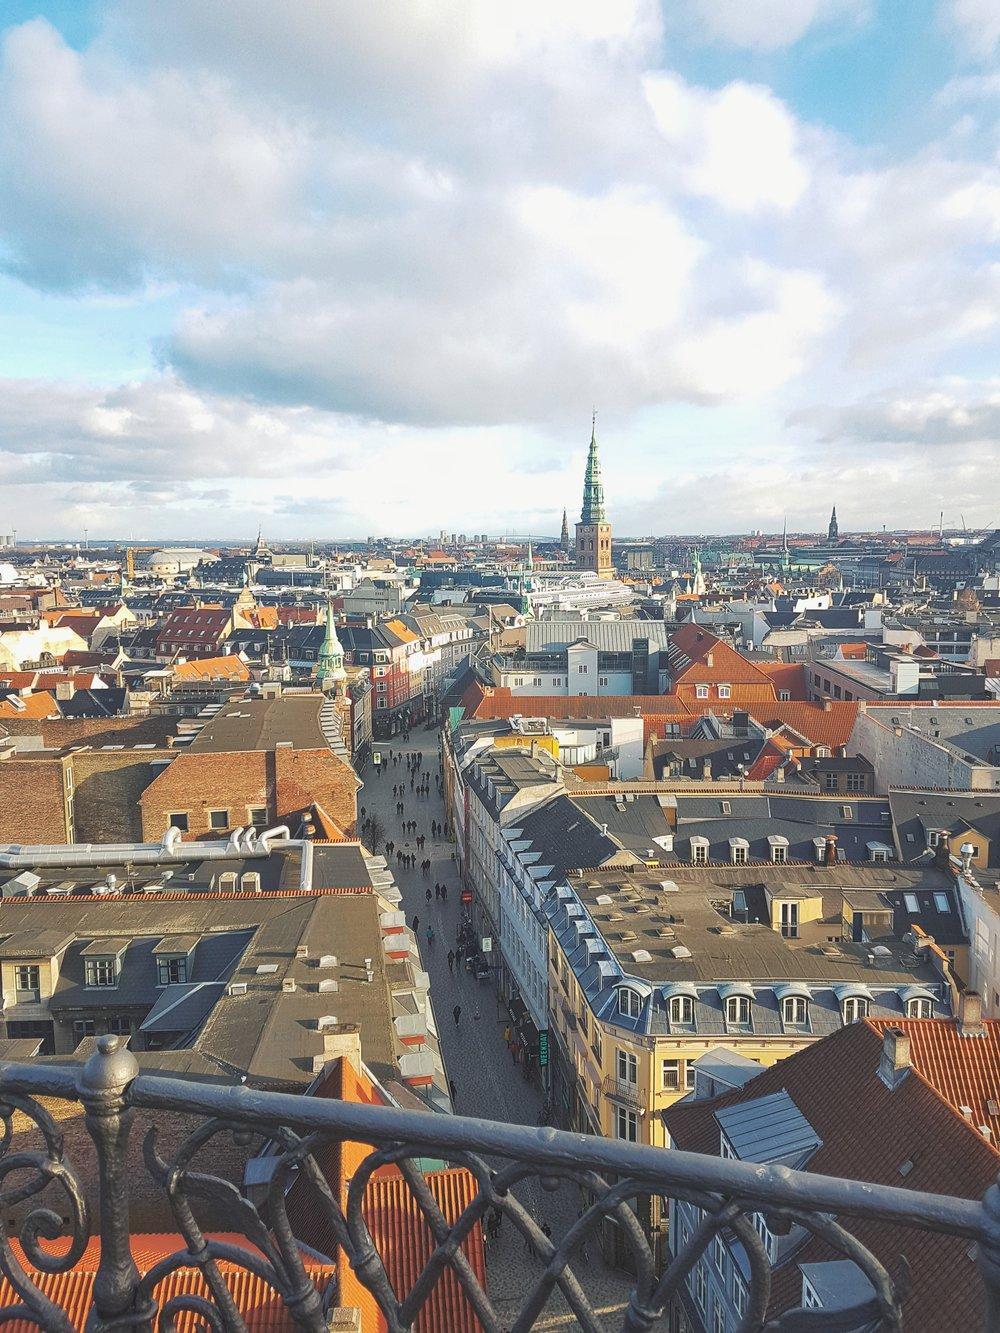 copenhagen. denmark. travel. adventure. europe. scandinavia. city viewhistory. travelblog..jpeg